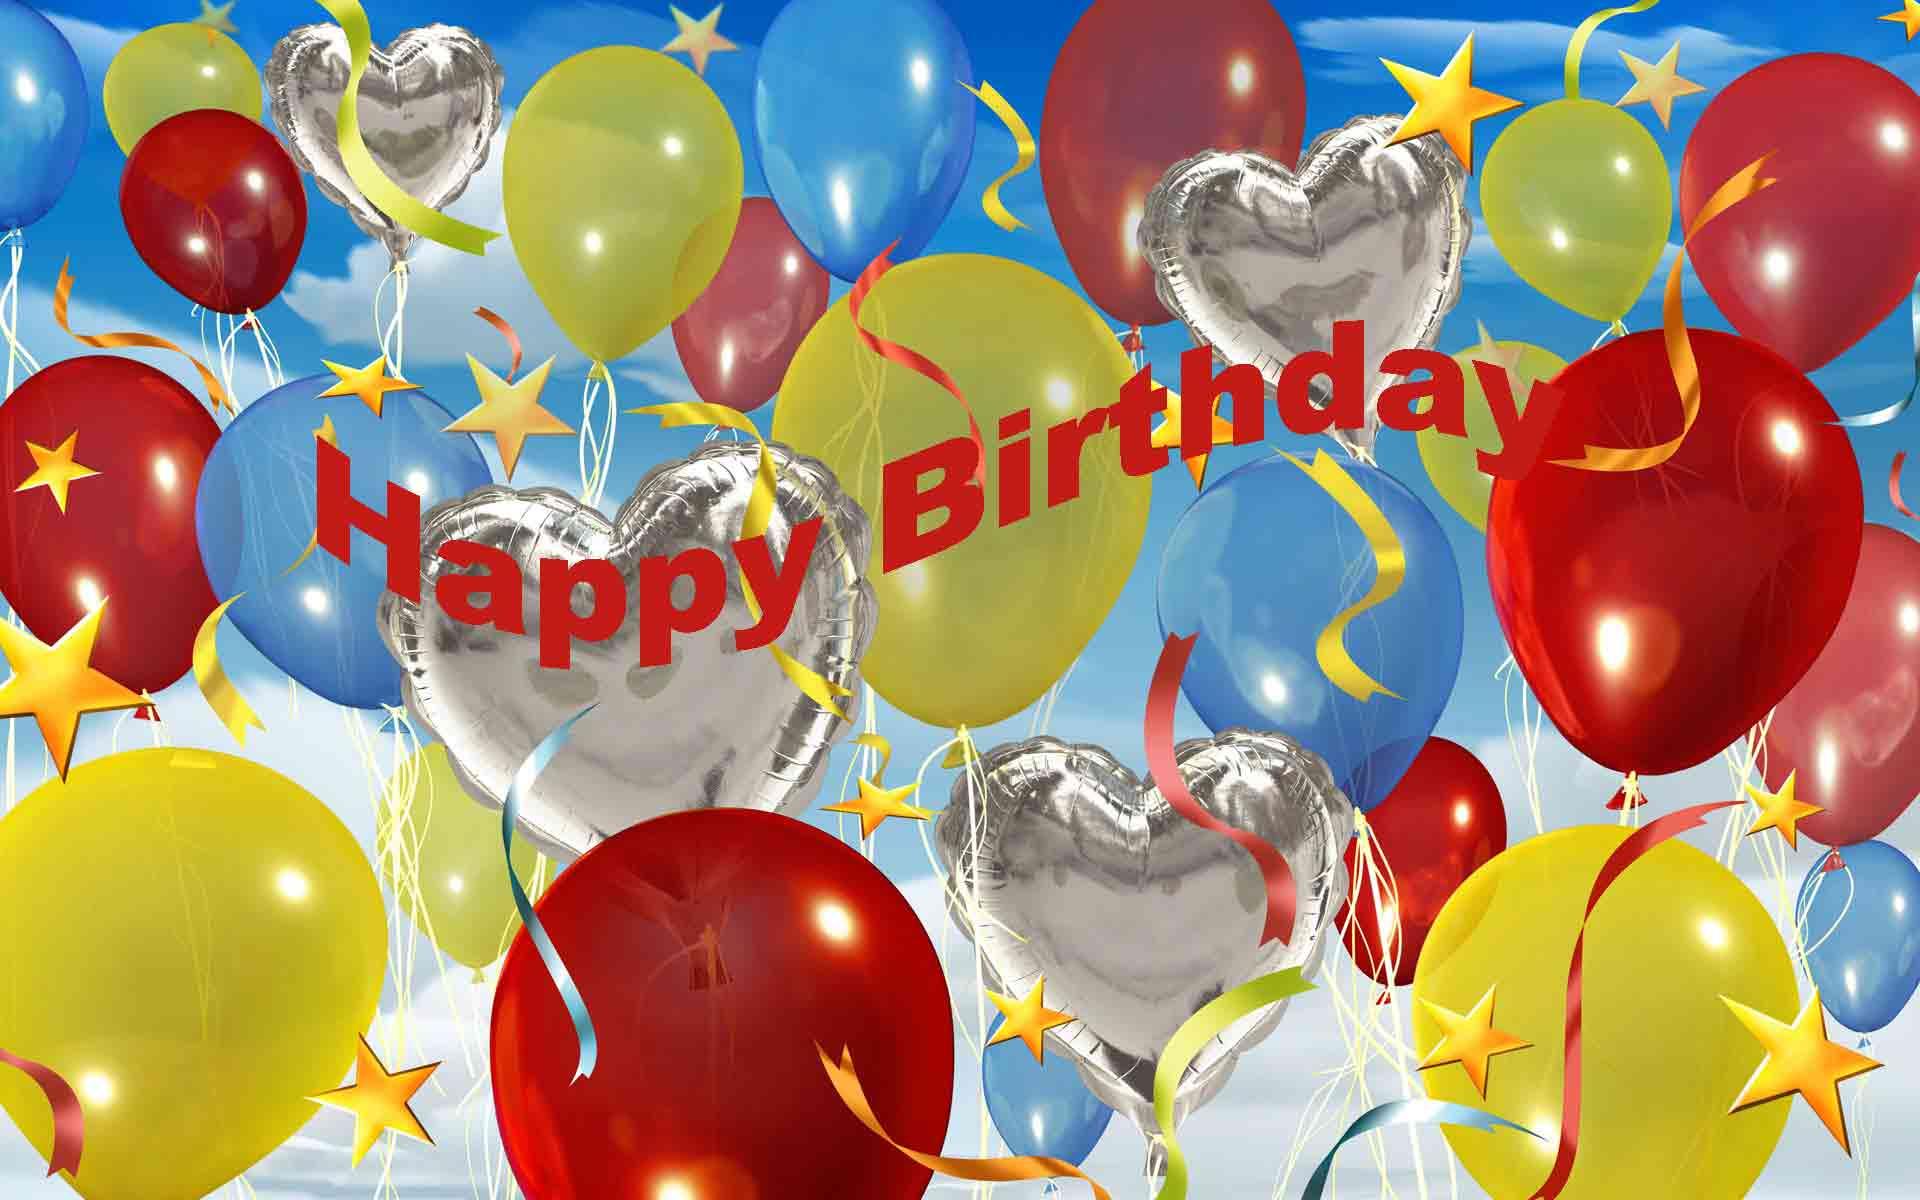 Happy Birthday Wallpaper - Full HD wallpaper search